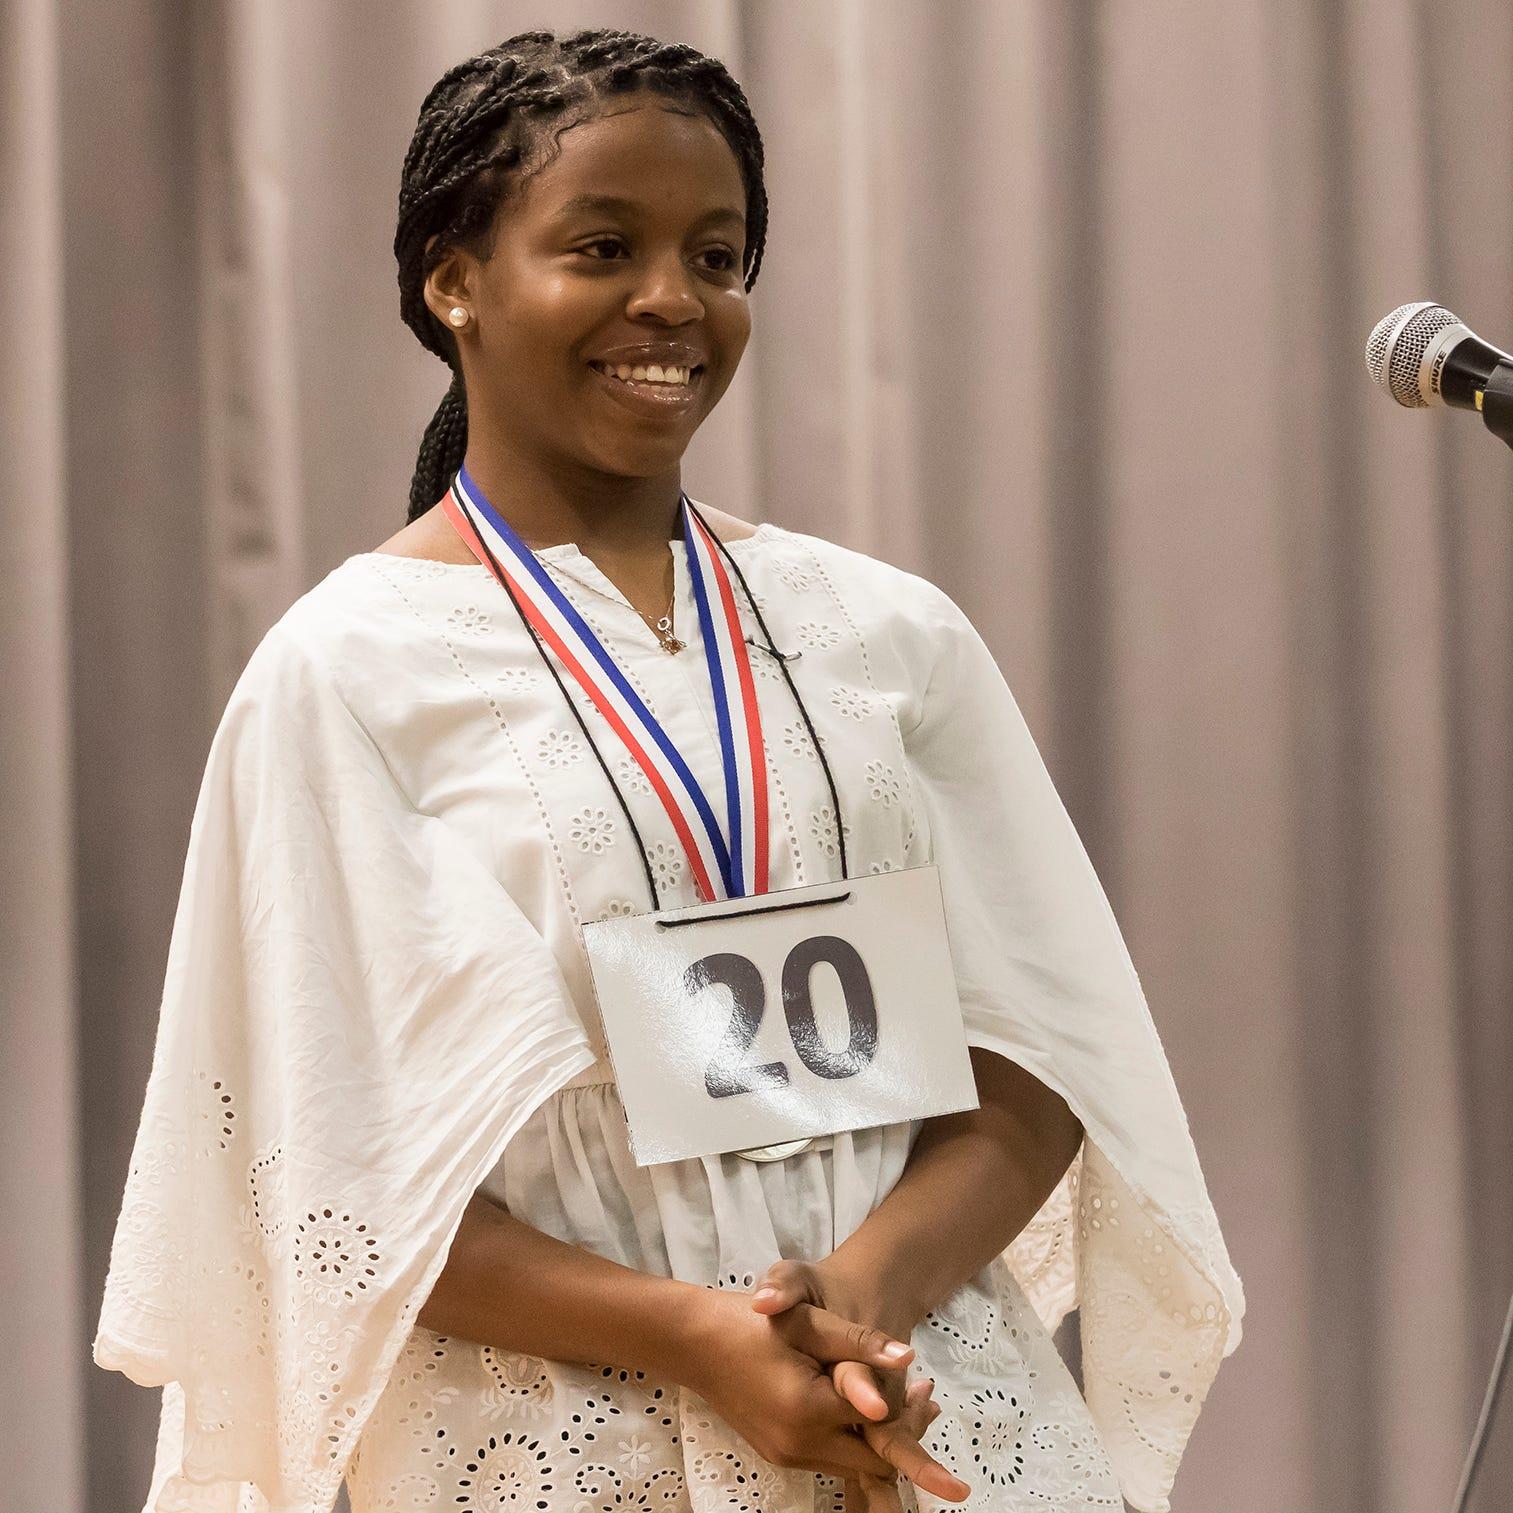 Bre'Ann Washington wins All-Parish Spelling Bee